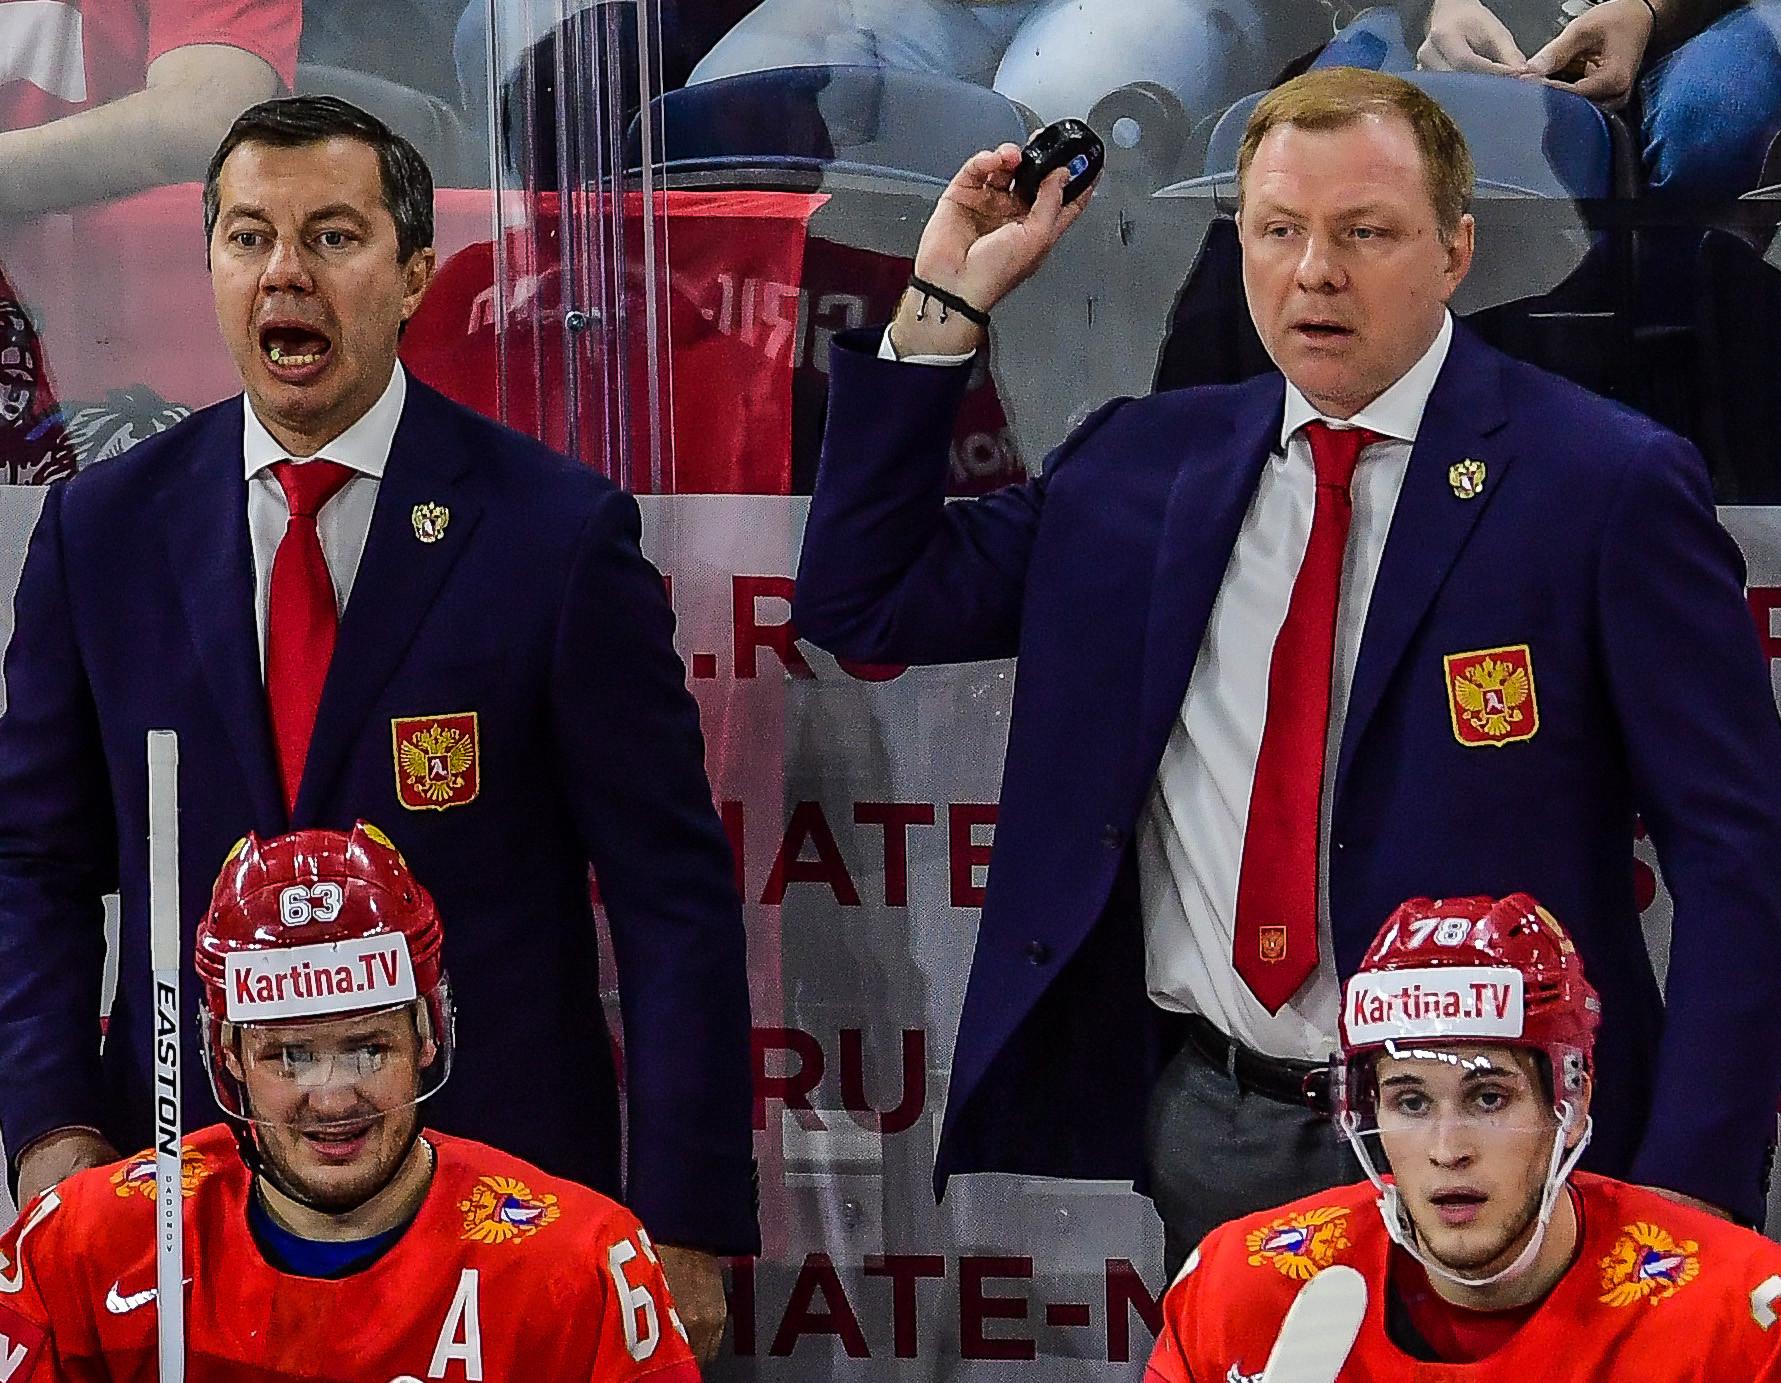 <p>Фото:&nbsp; &copy; РИА Новости/Алексей Куденко</p>